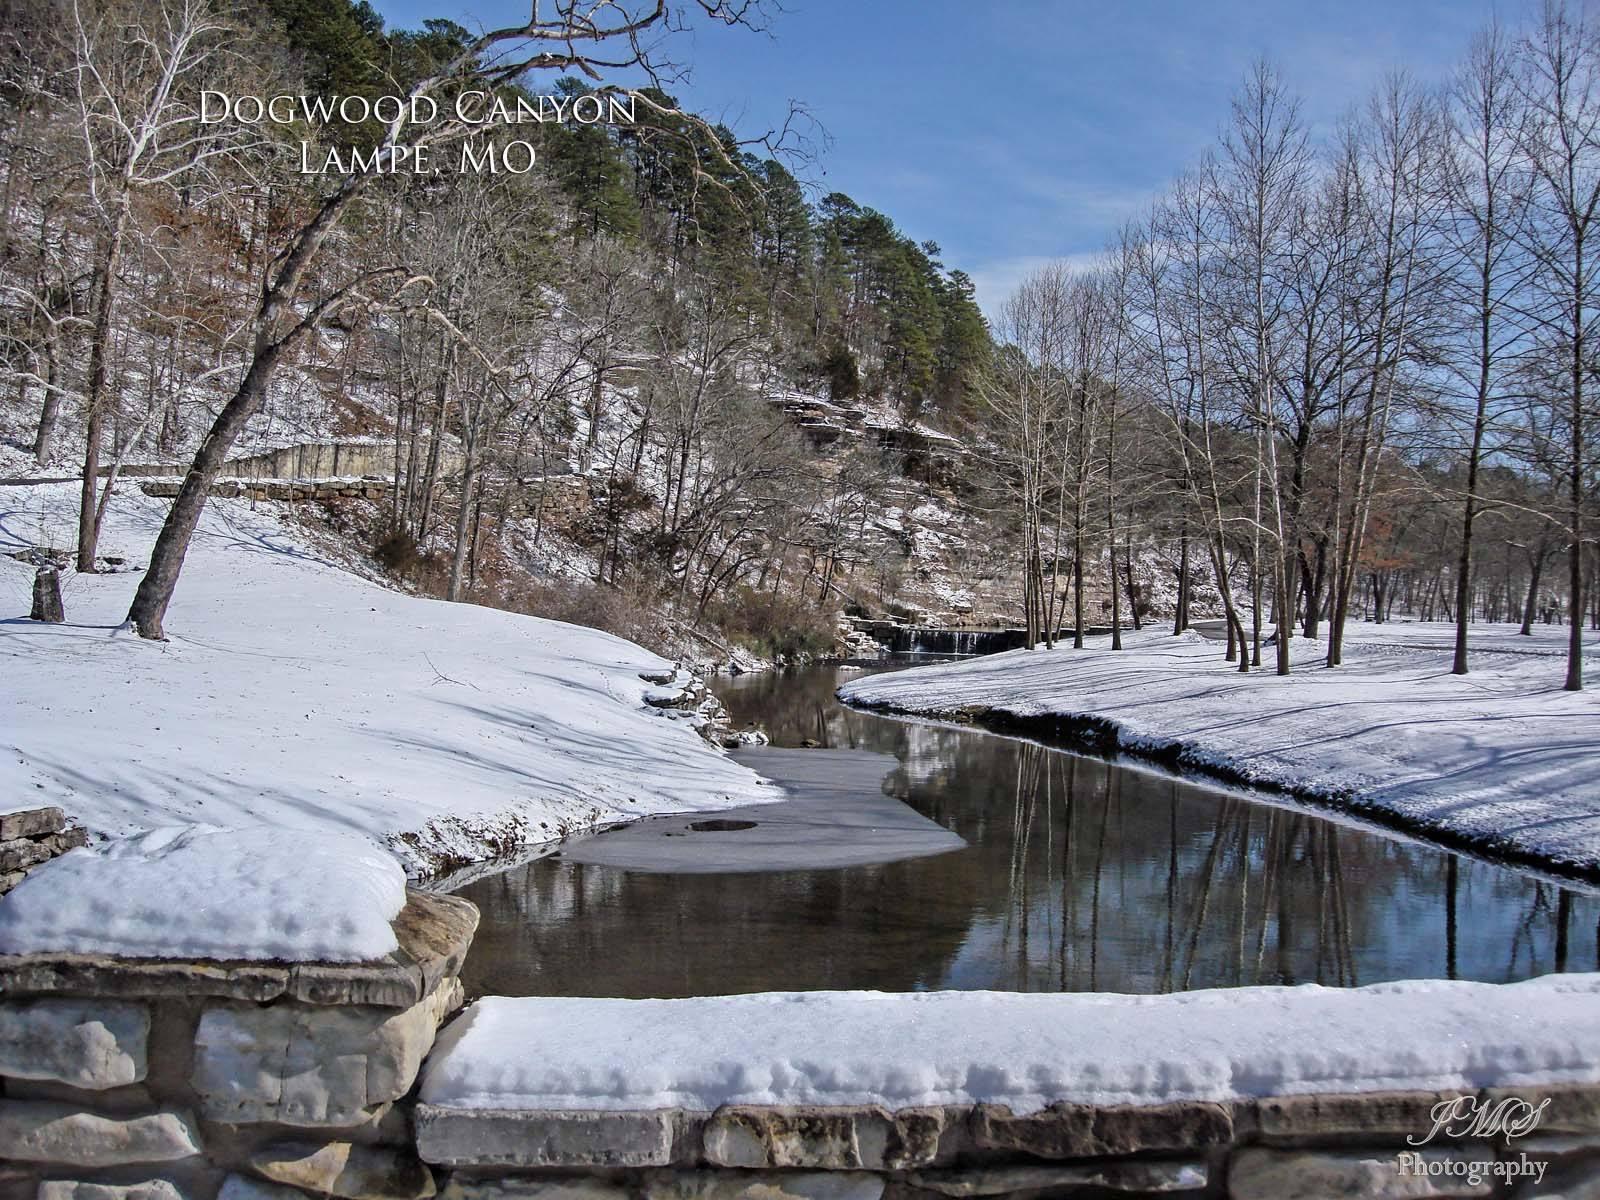 Snowy Dogwood Canyon